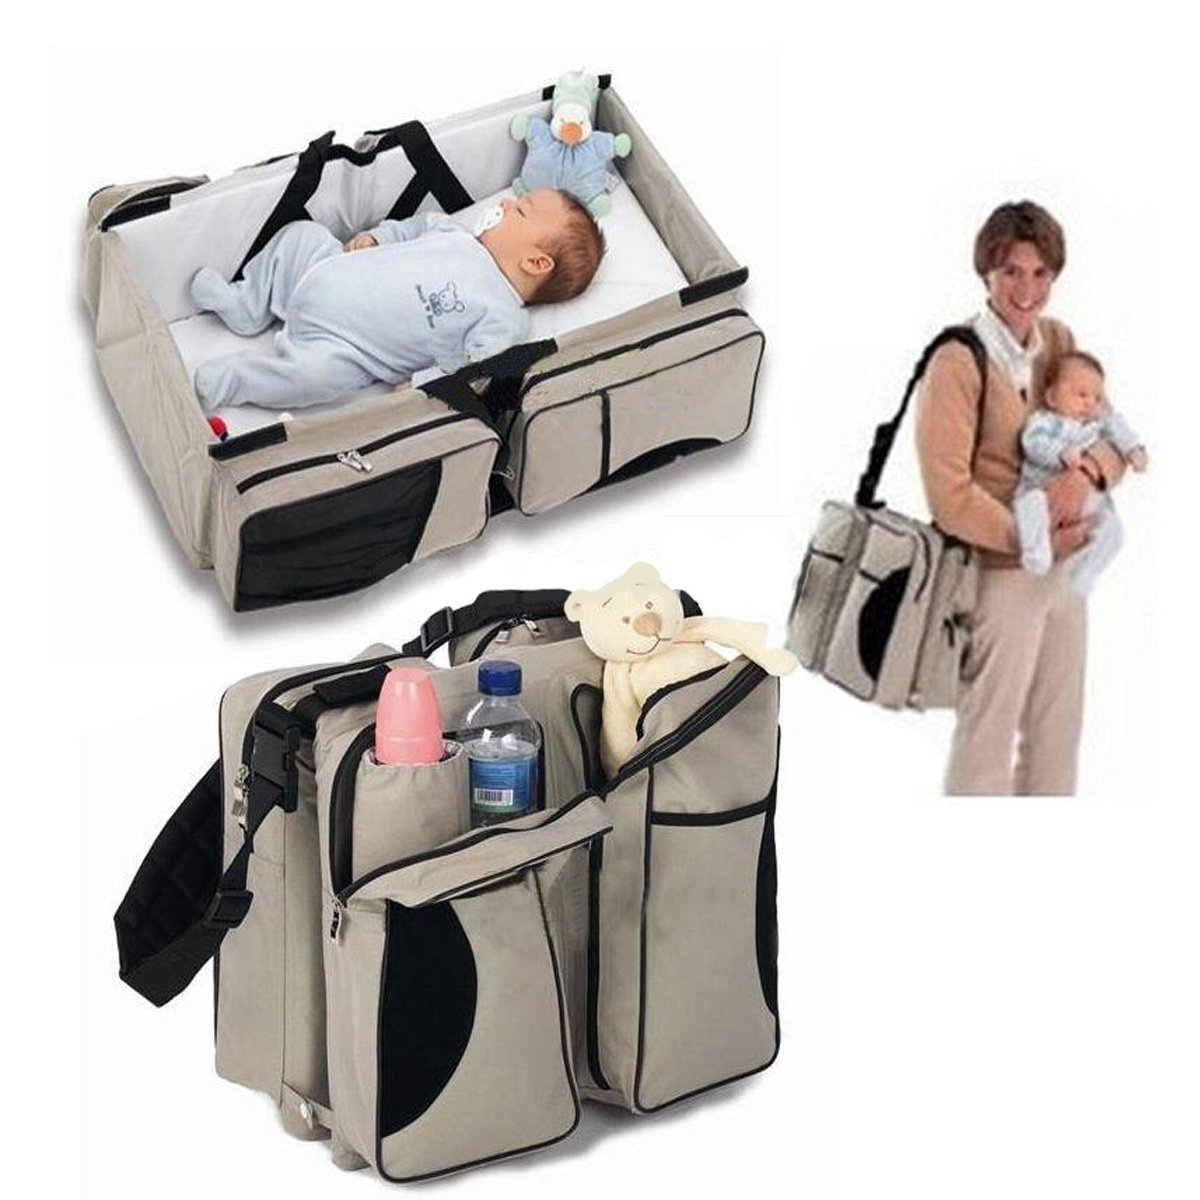 Newborn Baby Portable Travel Bed Travel Bag Crib Mommy Bag Crib